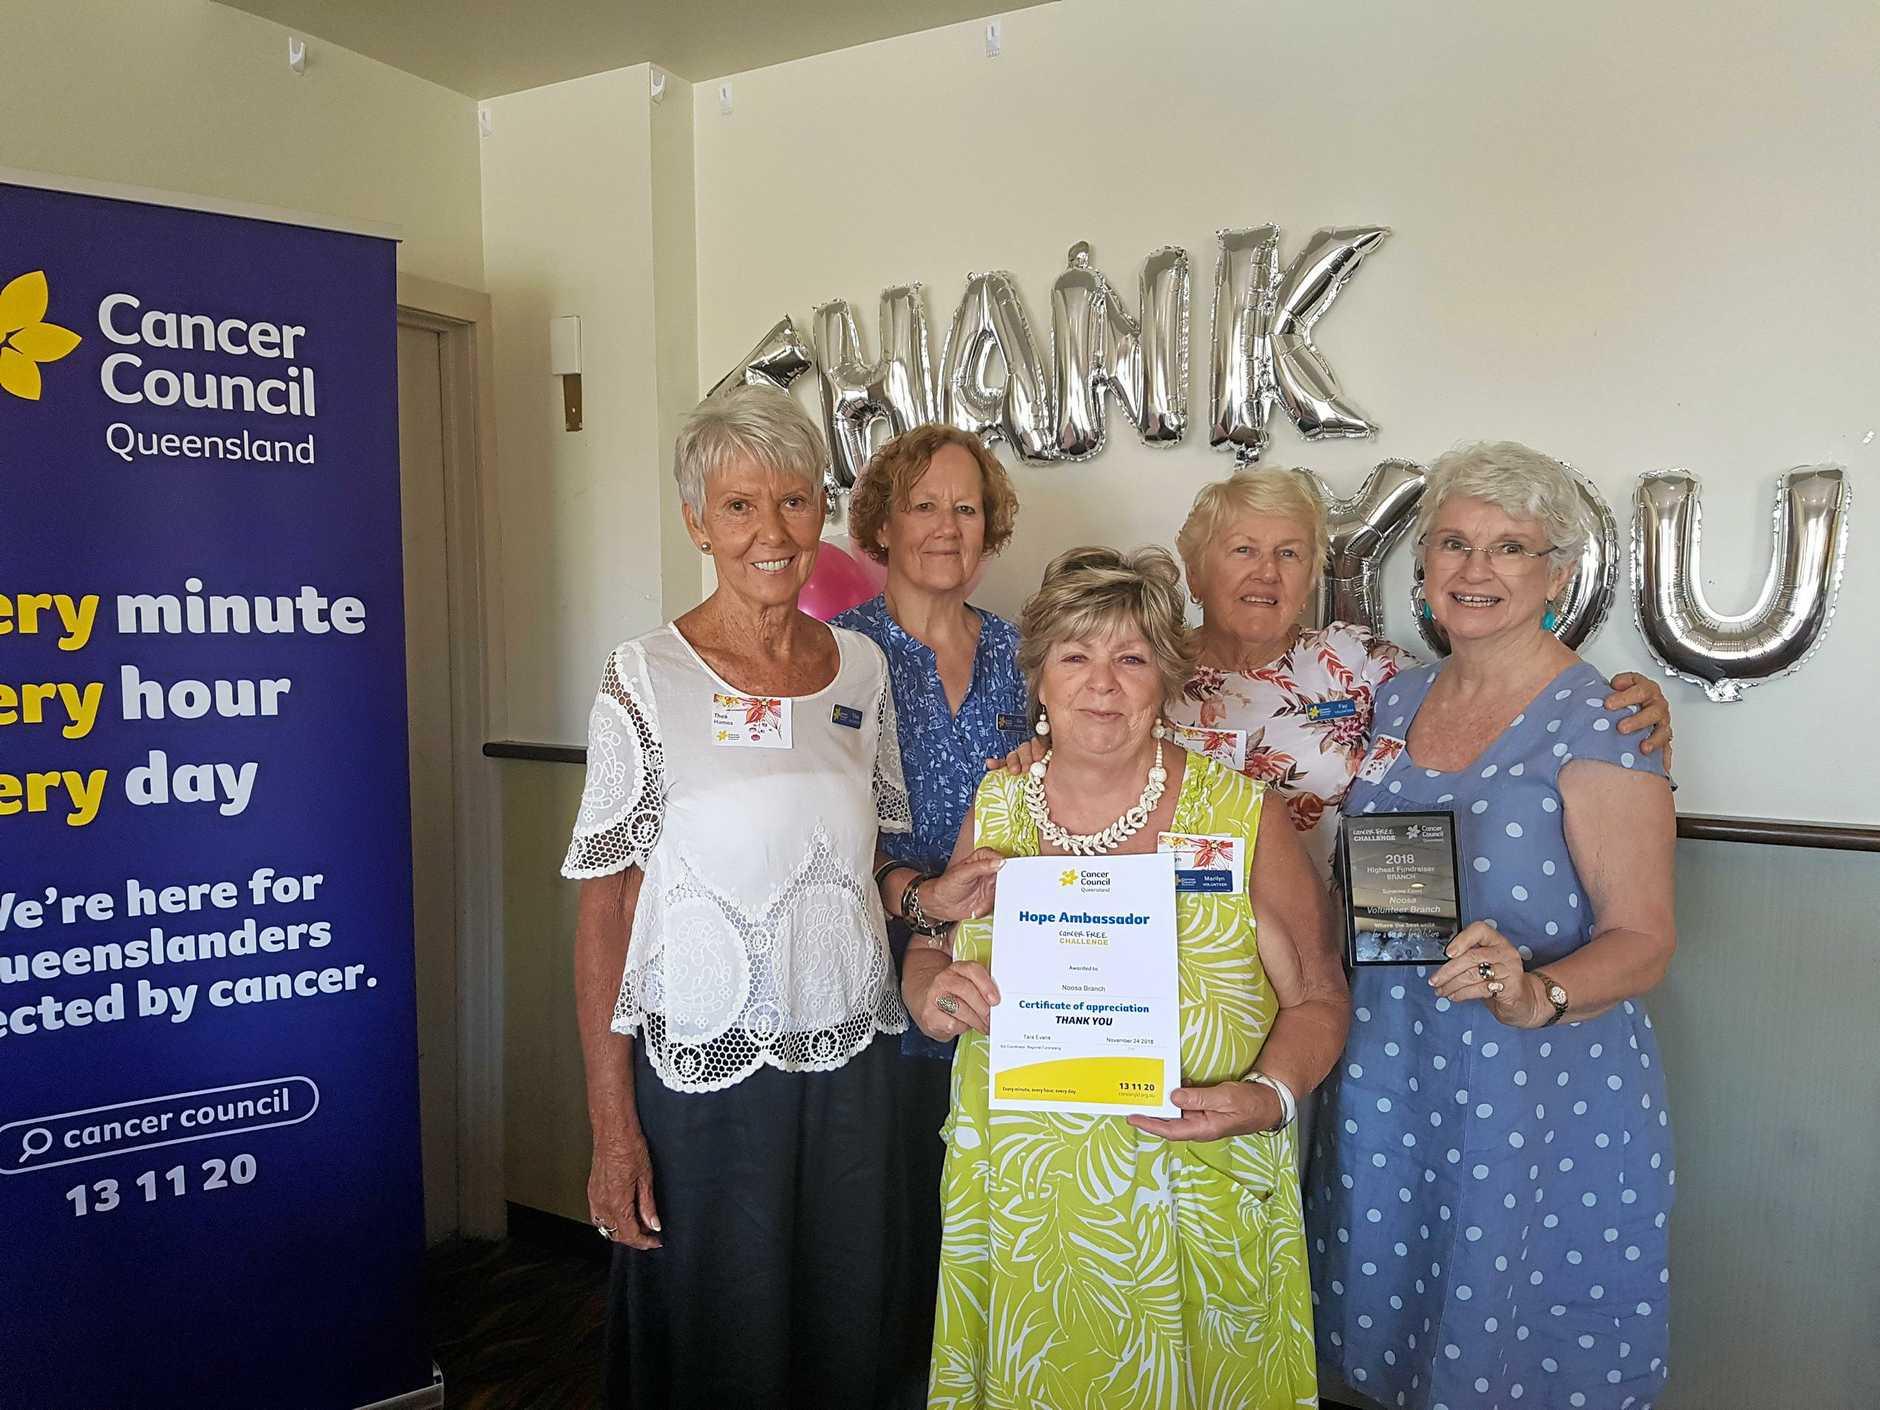 WONDERFUL EFFORT: Cancer Council Queensland Noosa Branch's Thea Holmes, Ena Murphy, Marilyn Kerr, Fay Hewson and Kathi Gow.